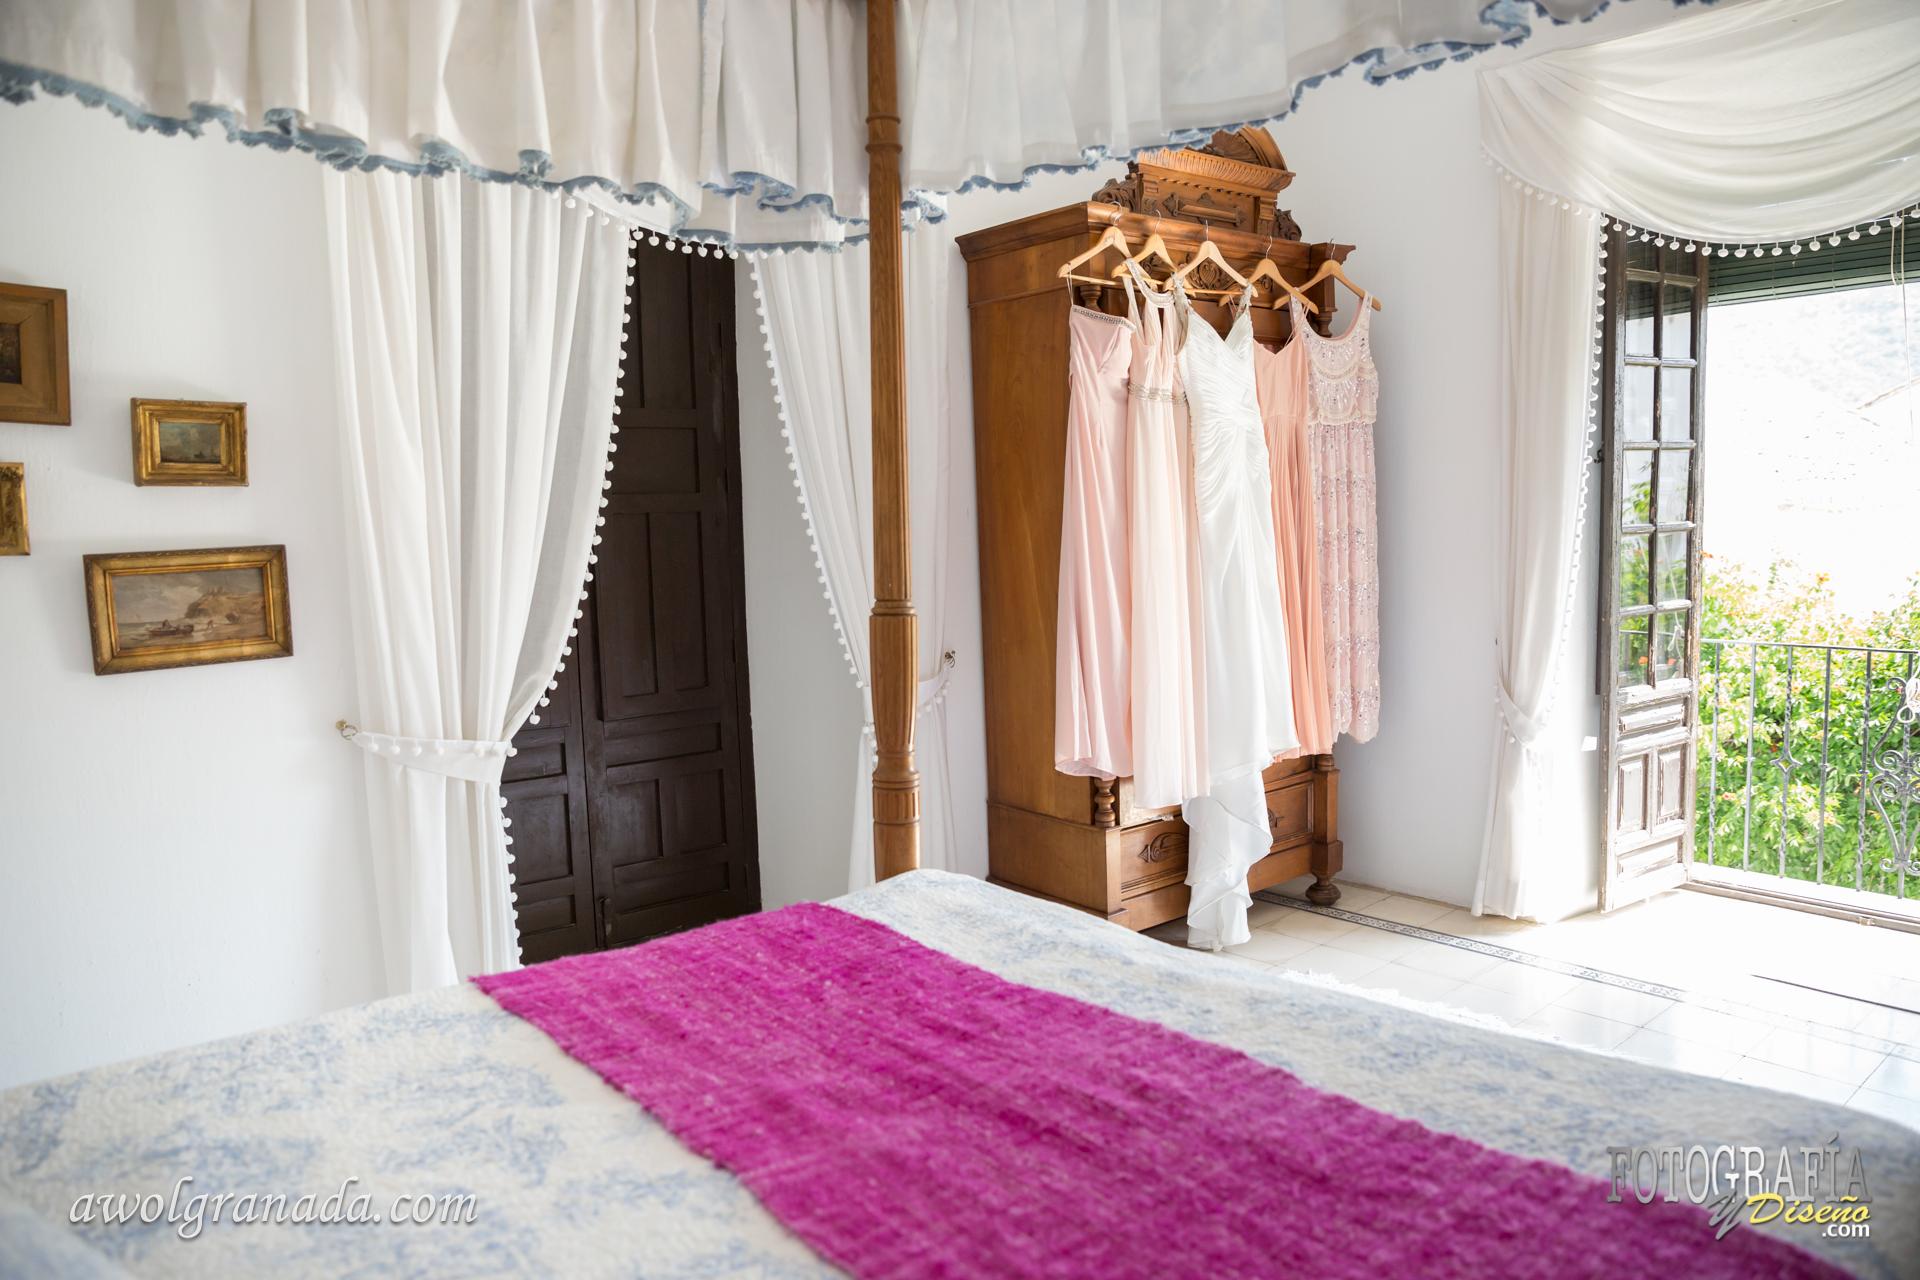 The Honeymoon Suite in the Palacete de Cazulas